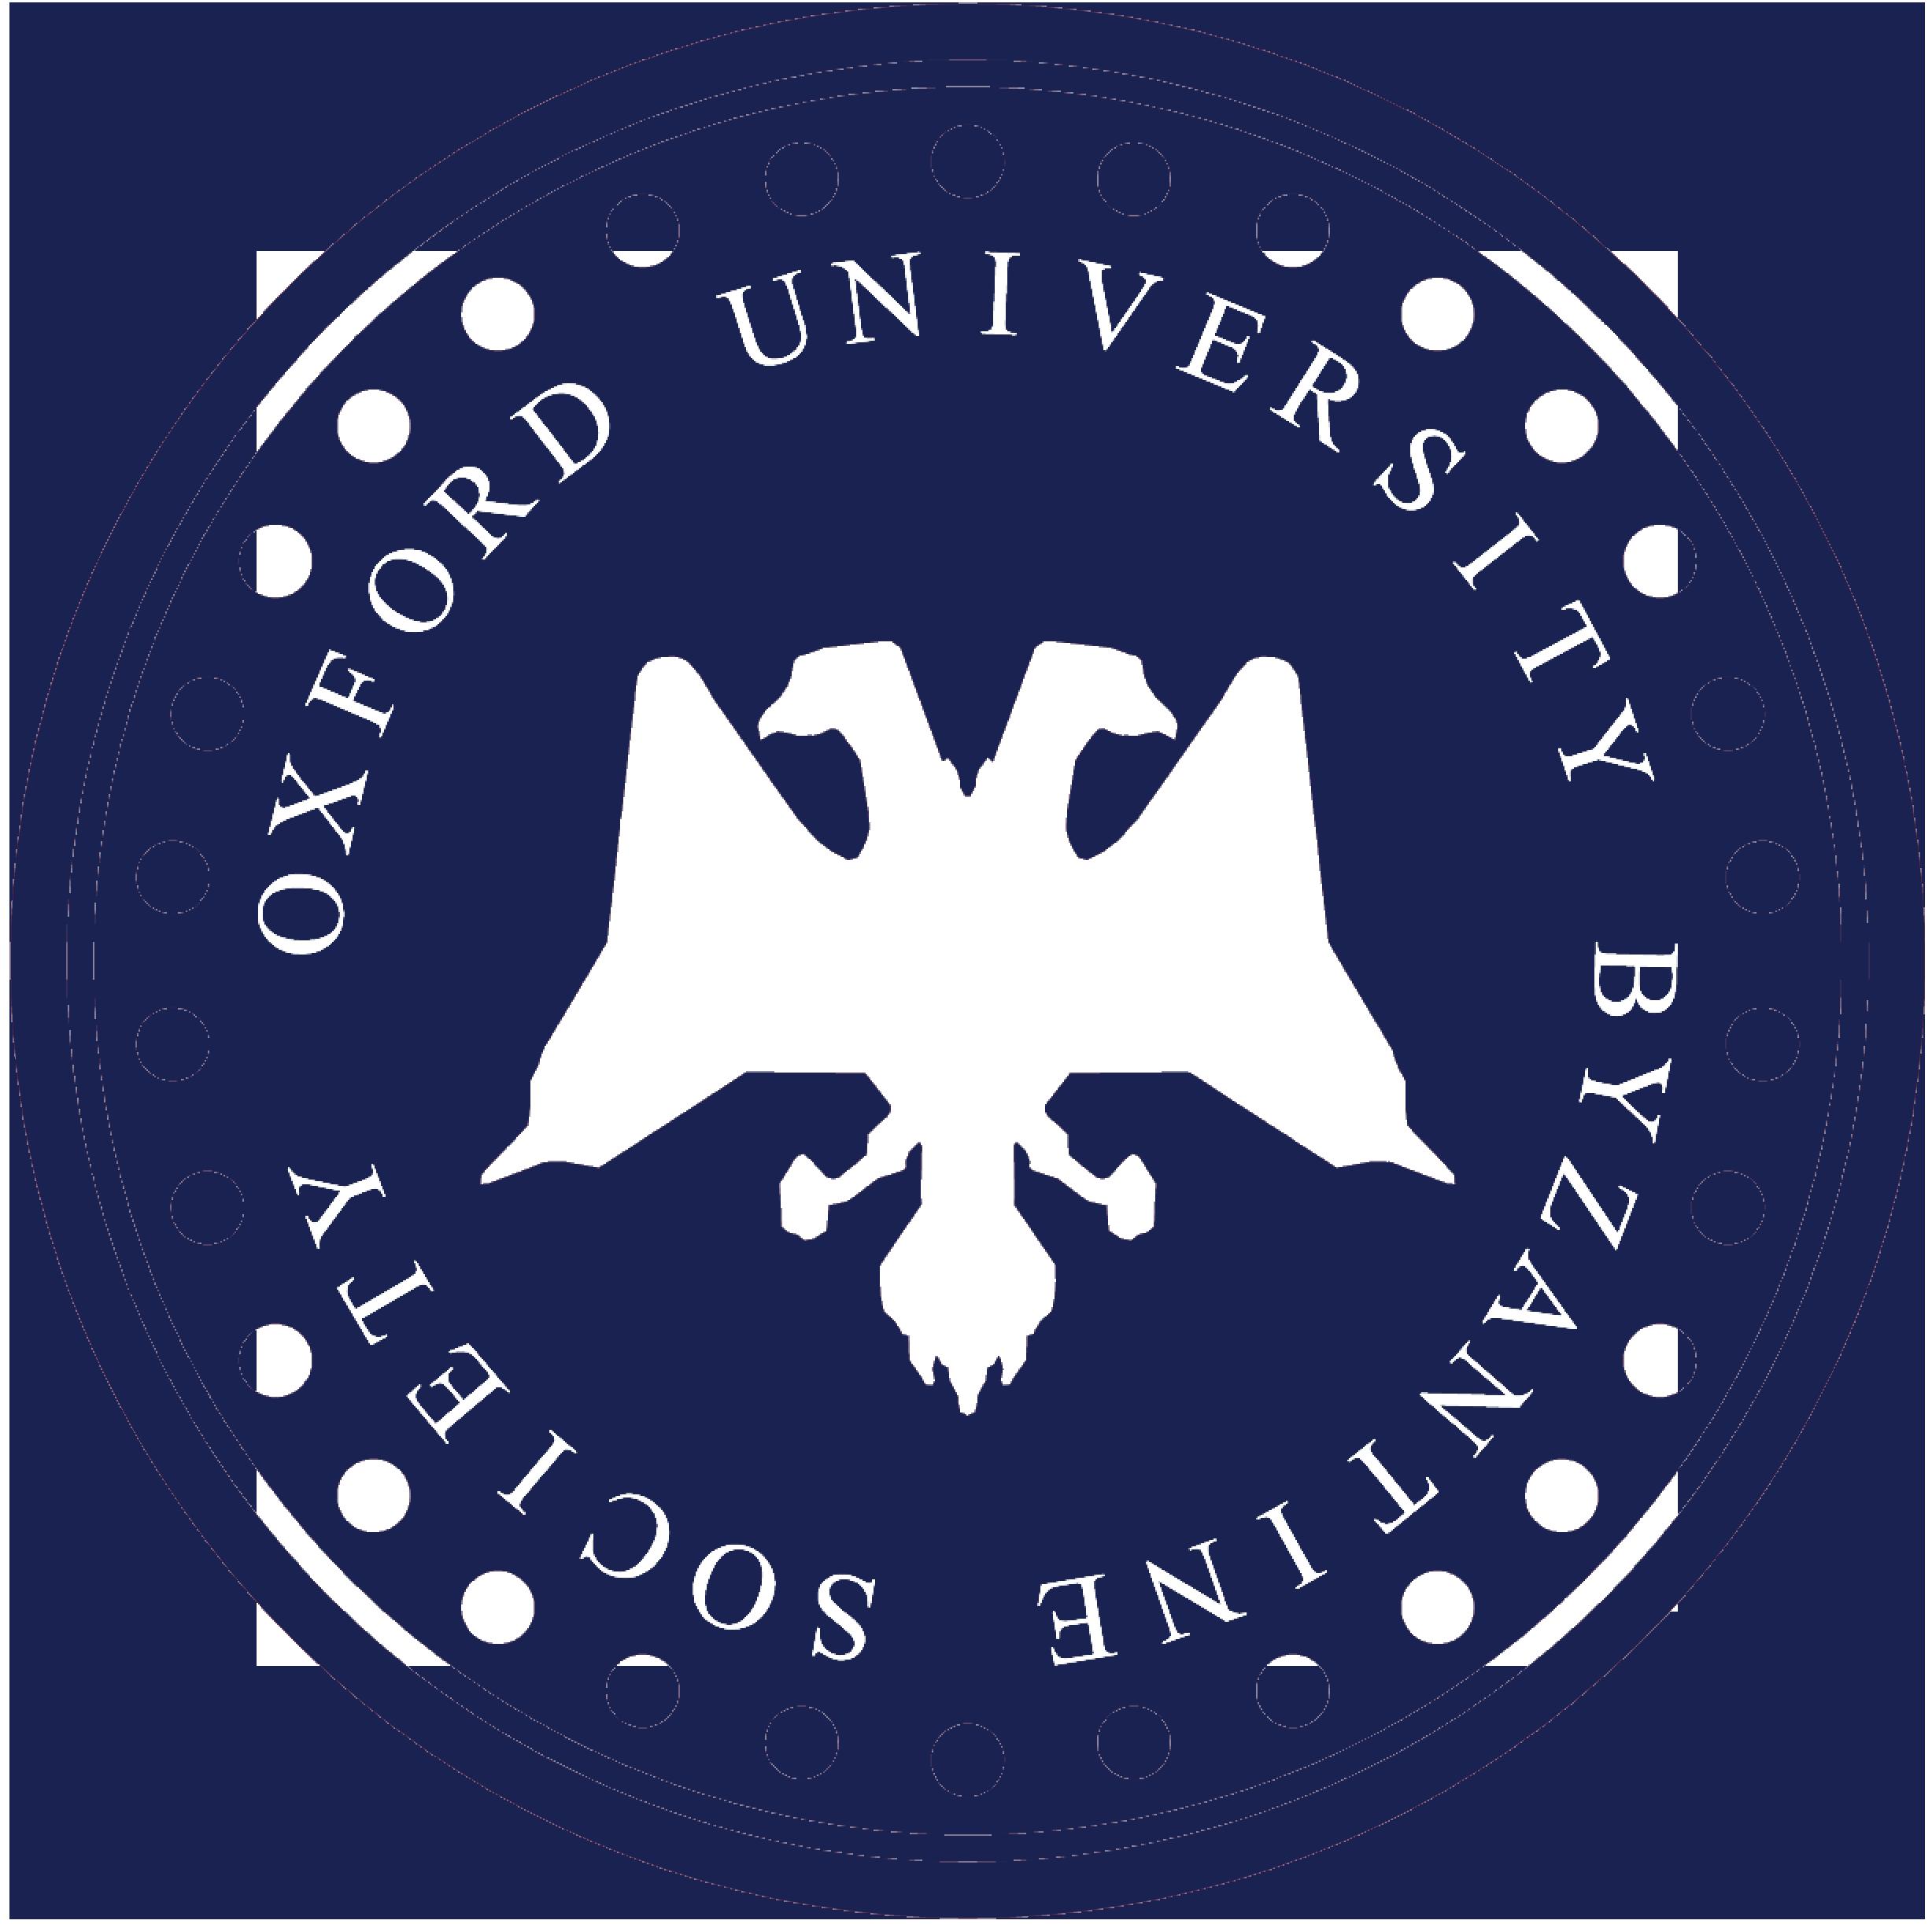 Oxford University Byzantine Society | The official website